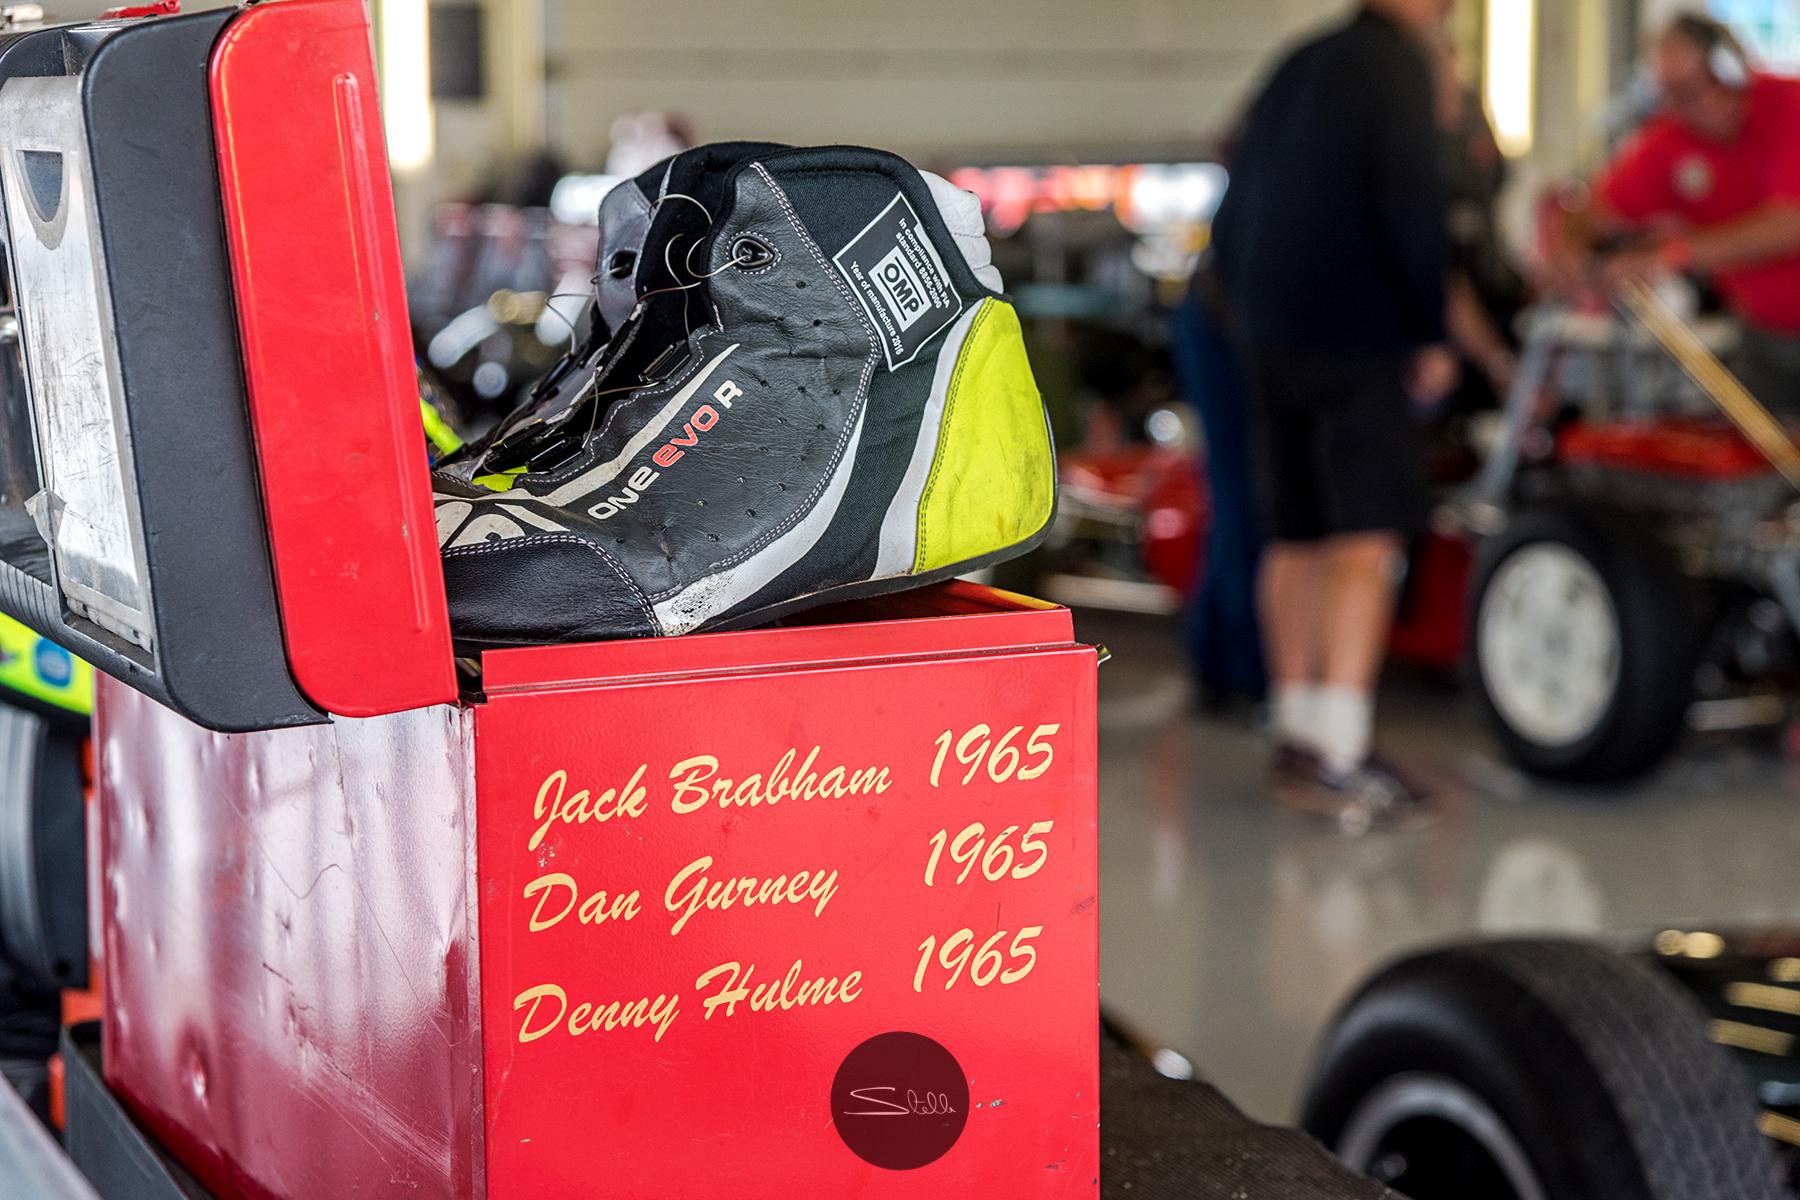 Stella Scordellis Silverstone Classic 2017 23 Watermarked.jpg